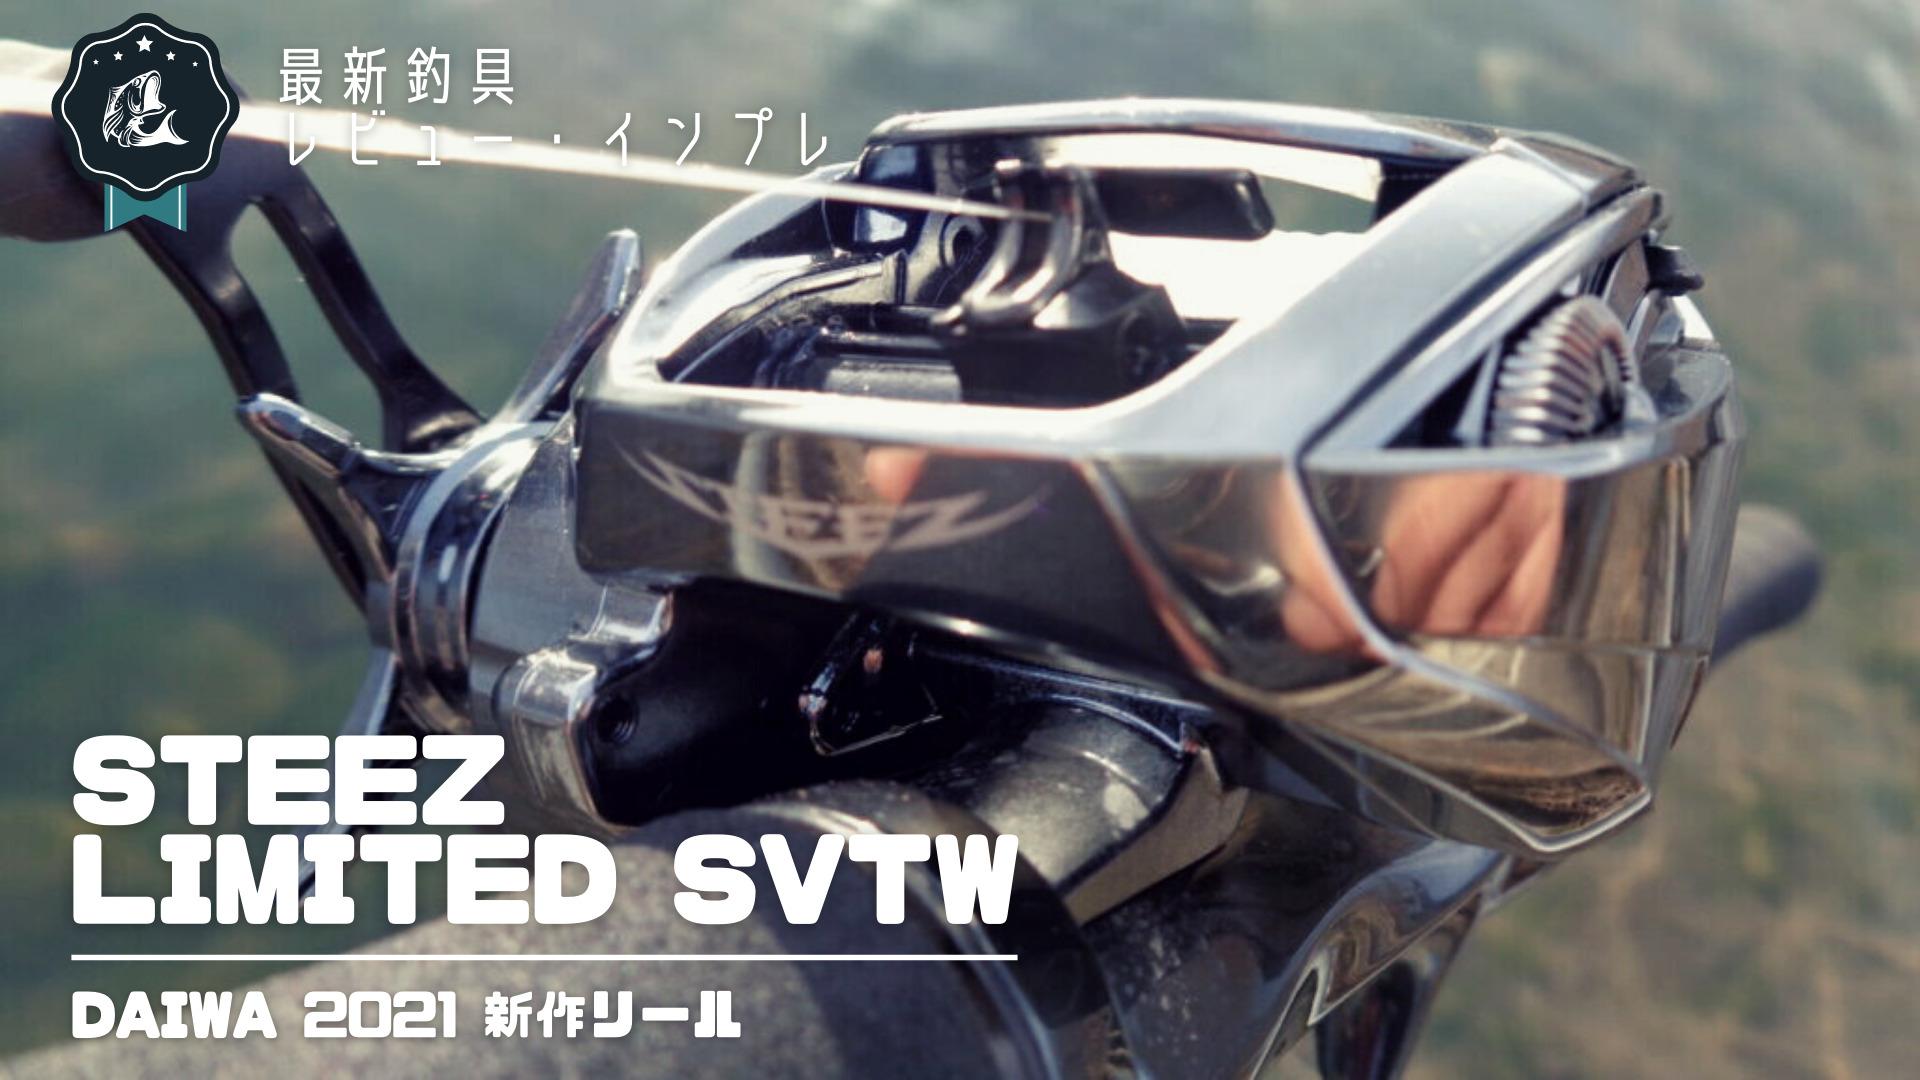 STEEZ LIMITED SVTWの本音レビュー&インプレ!ダイワ2021年新作の実力は本物か